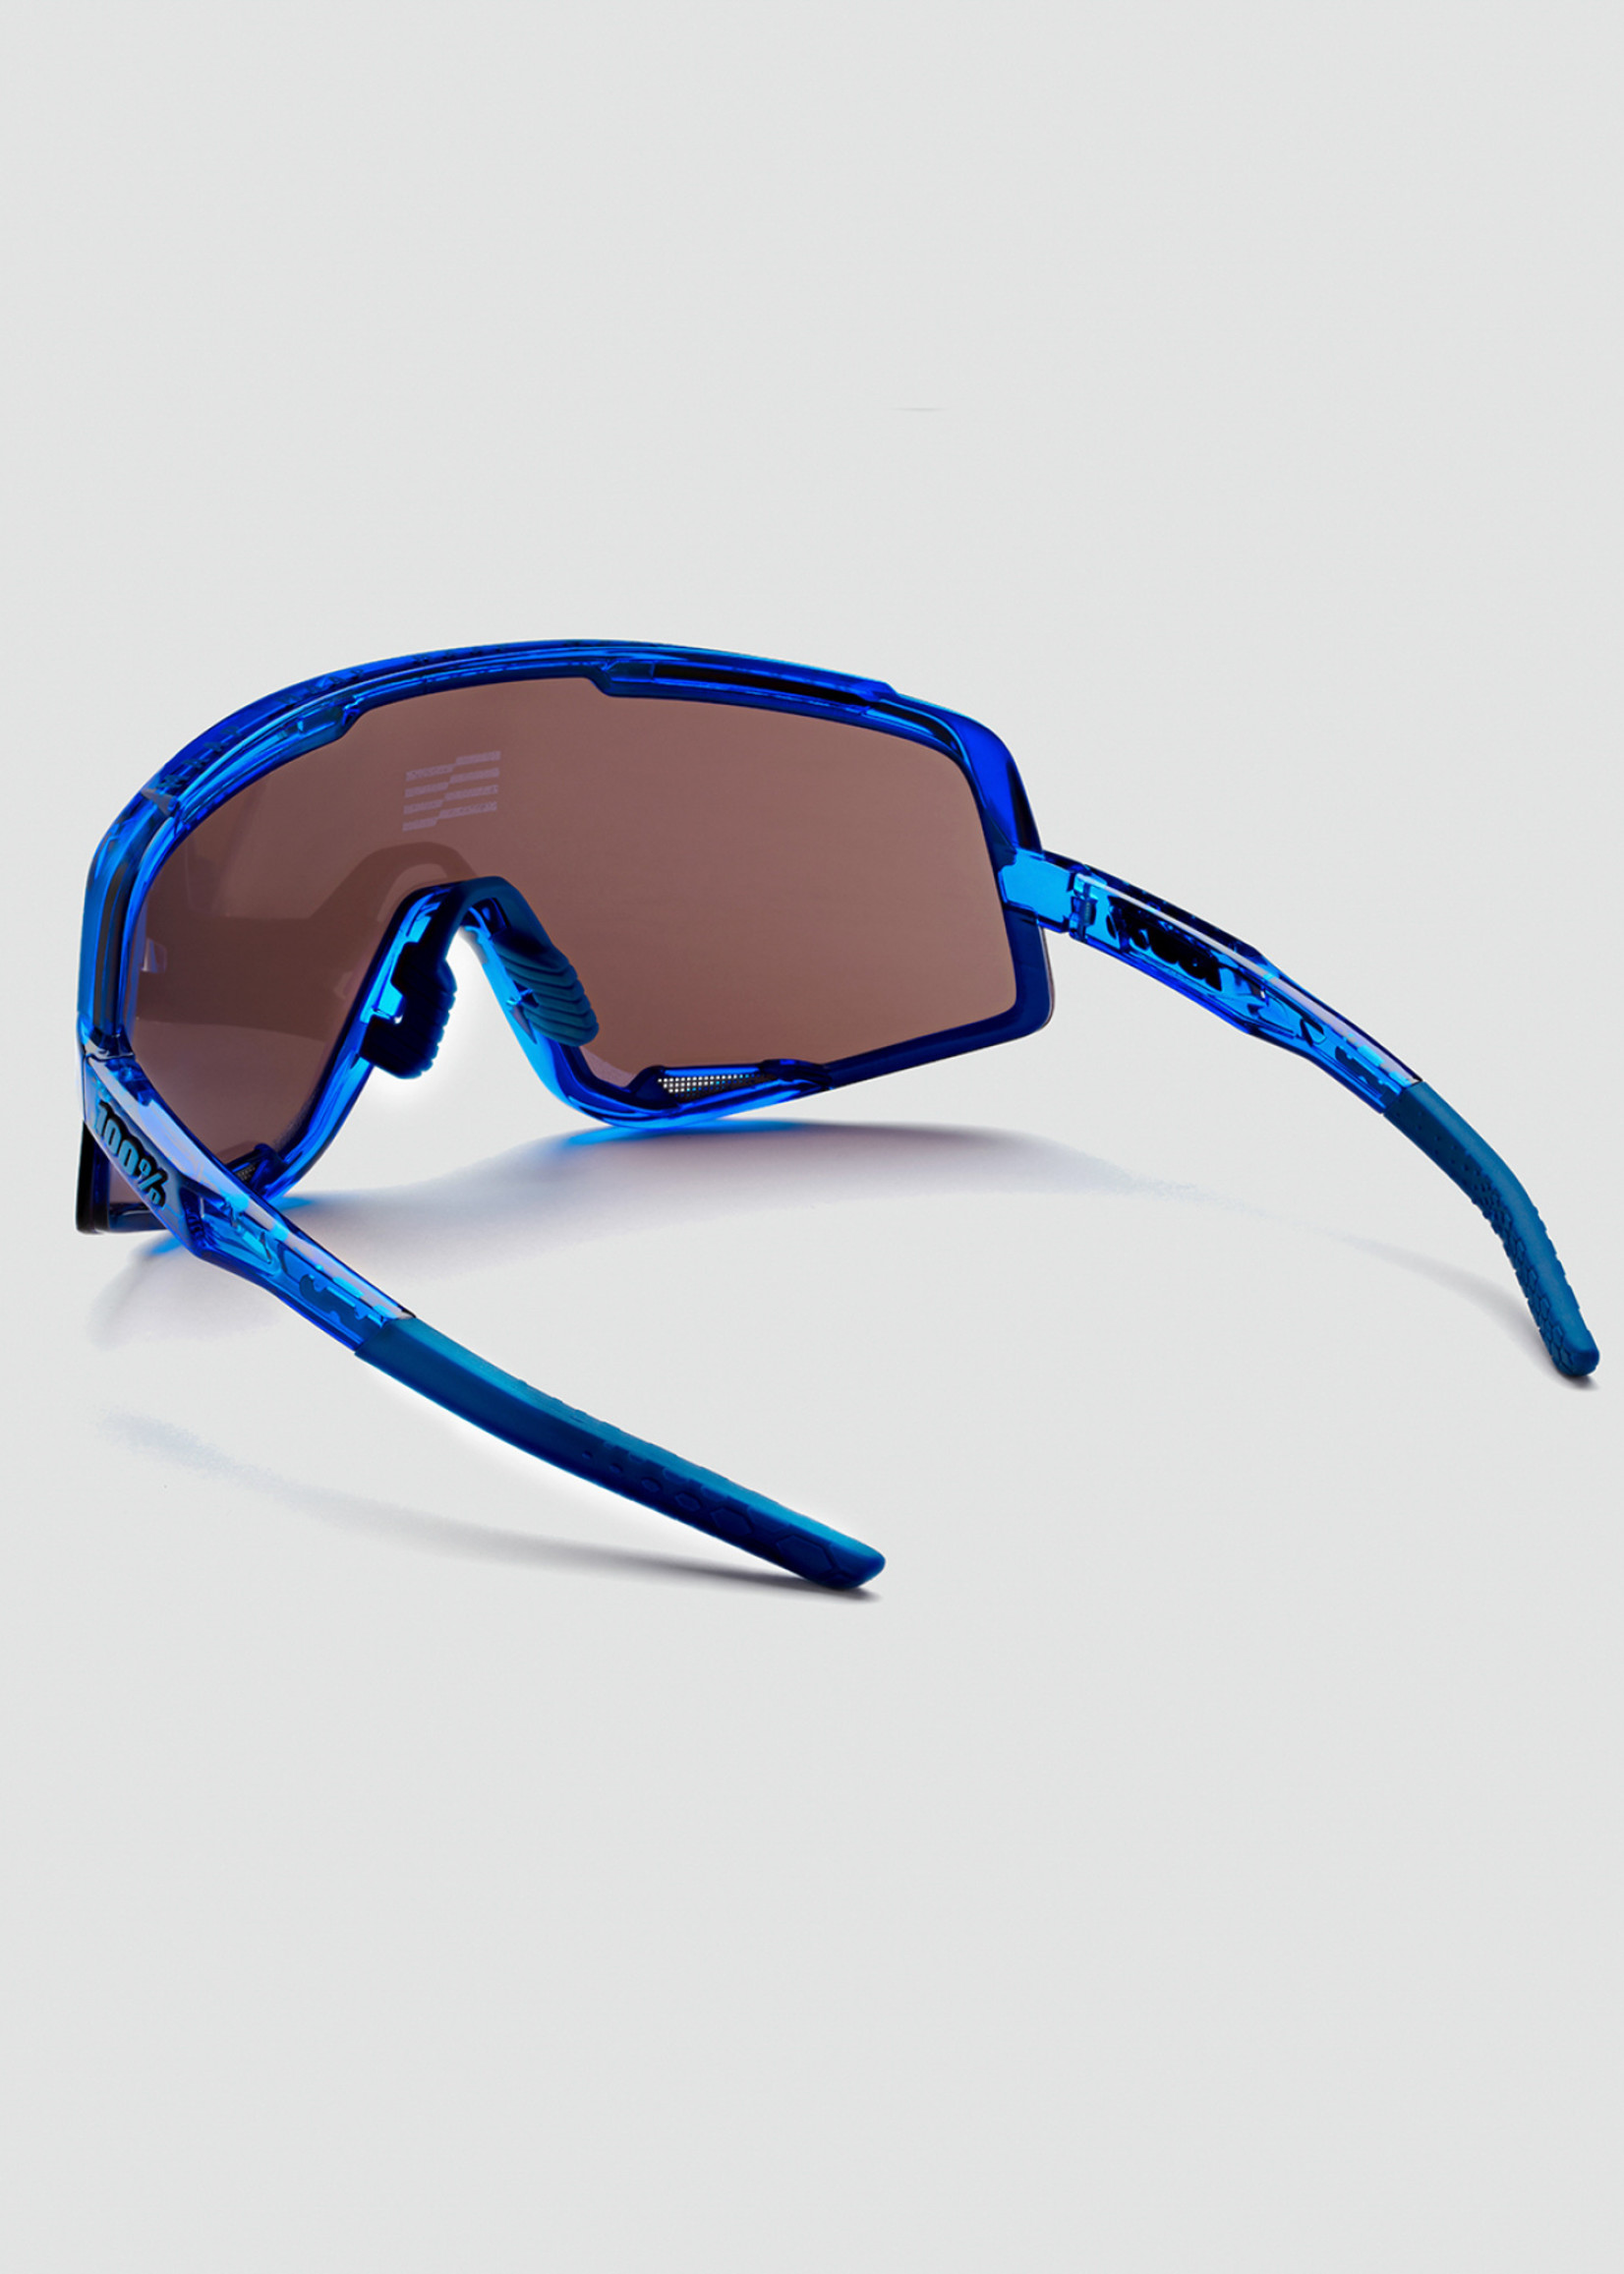 100% Glendale x Maap Zonnebril - Blauw